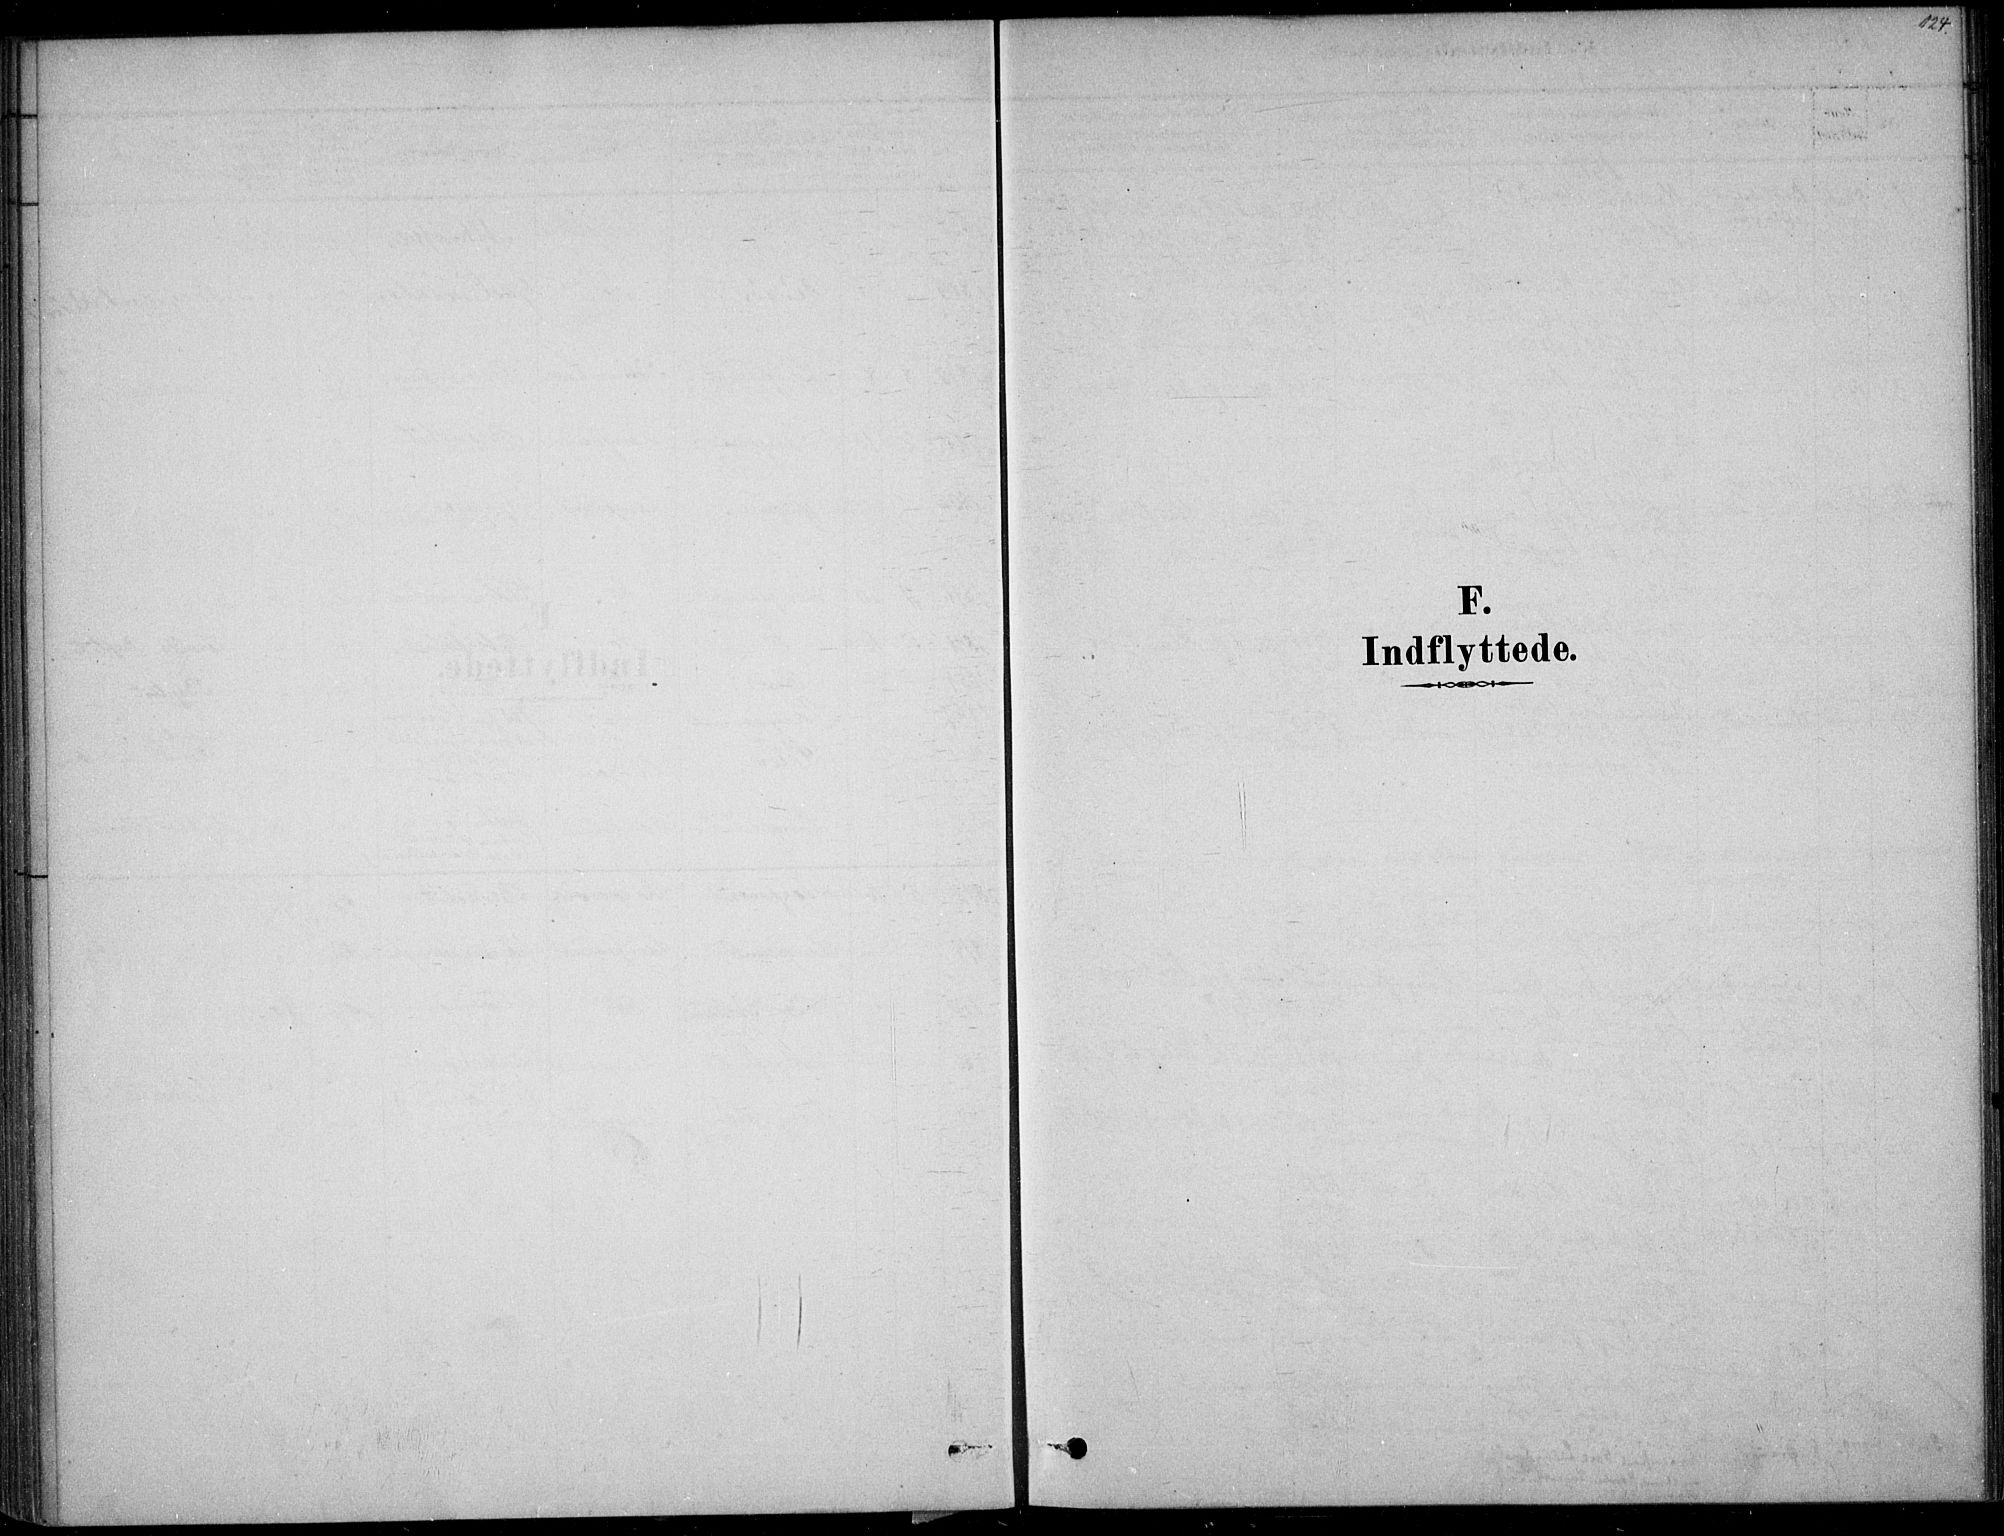 SAKO, Langesund kirkebøker, F/Fa/L0002: Ministerialbok nr. 2, 1878-1892, s. 124